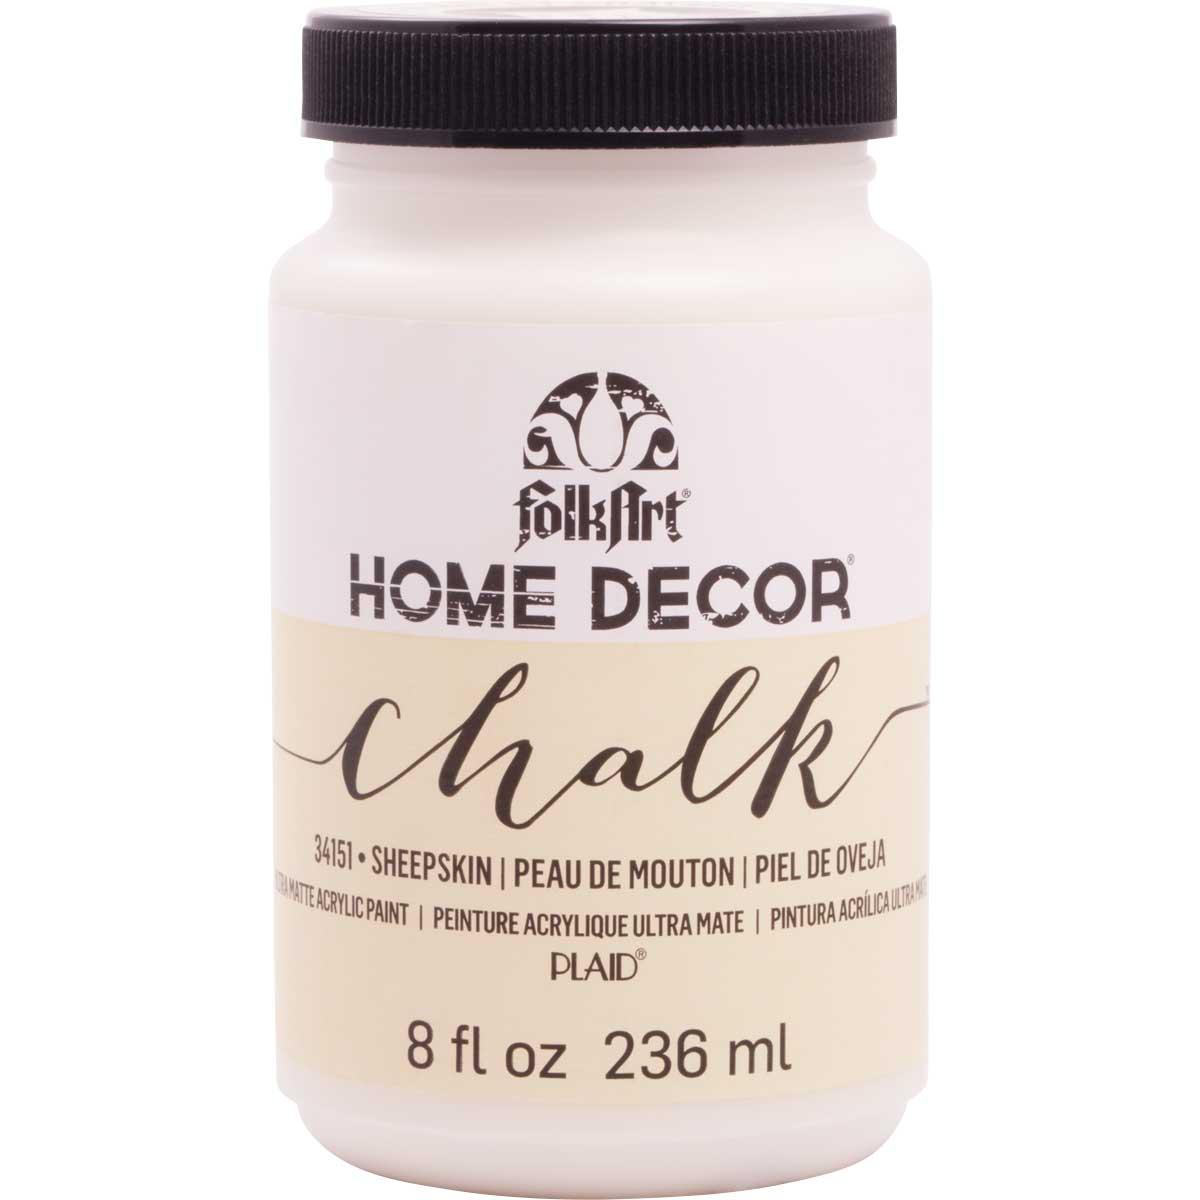 FolkArt ® Home Decor™ Chalk - Sheepskin, 8 oz.